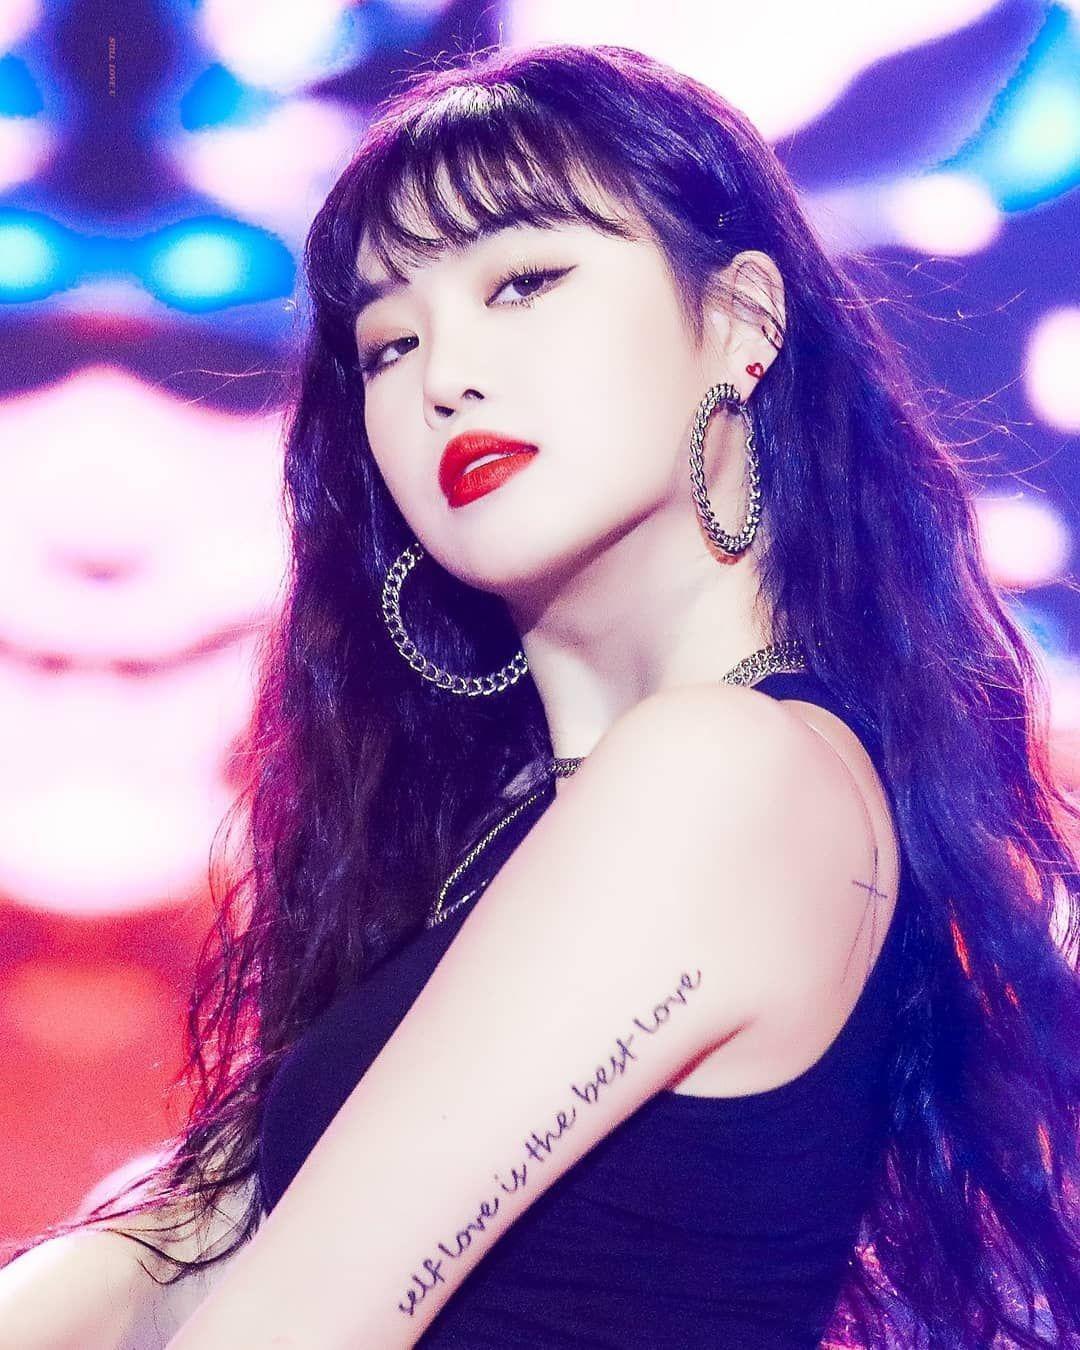 G)I-DLE SOOJIN 수진 on Instagram: [190925 HQ] 천은 흥타령 still love u . . #SOOJIN #수진 #SEOSOOJIN #서수진 #GIDLE #G_I_DLE #여자아… | Kpop tattoos, Kpop girl groups, Kpop girls